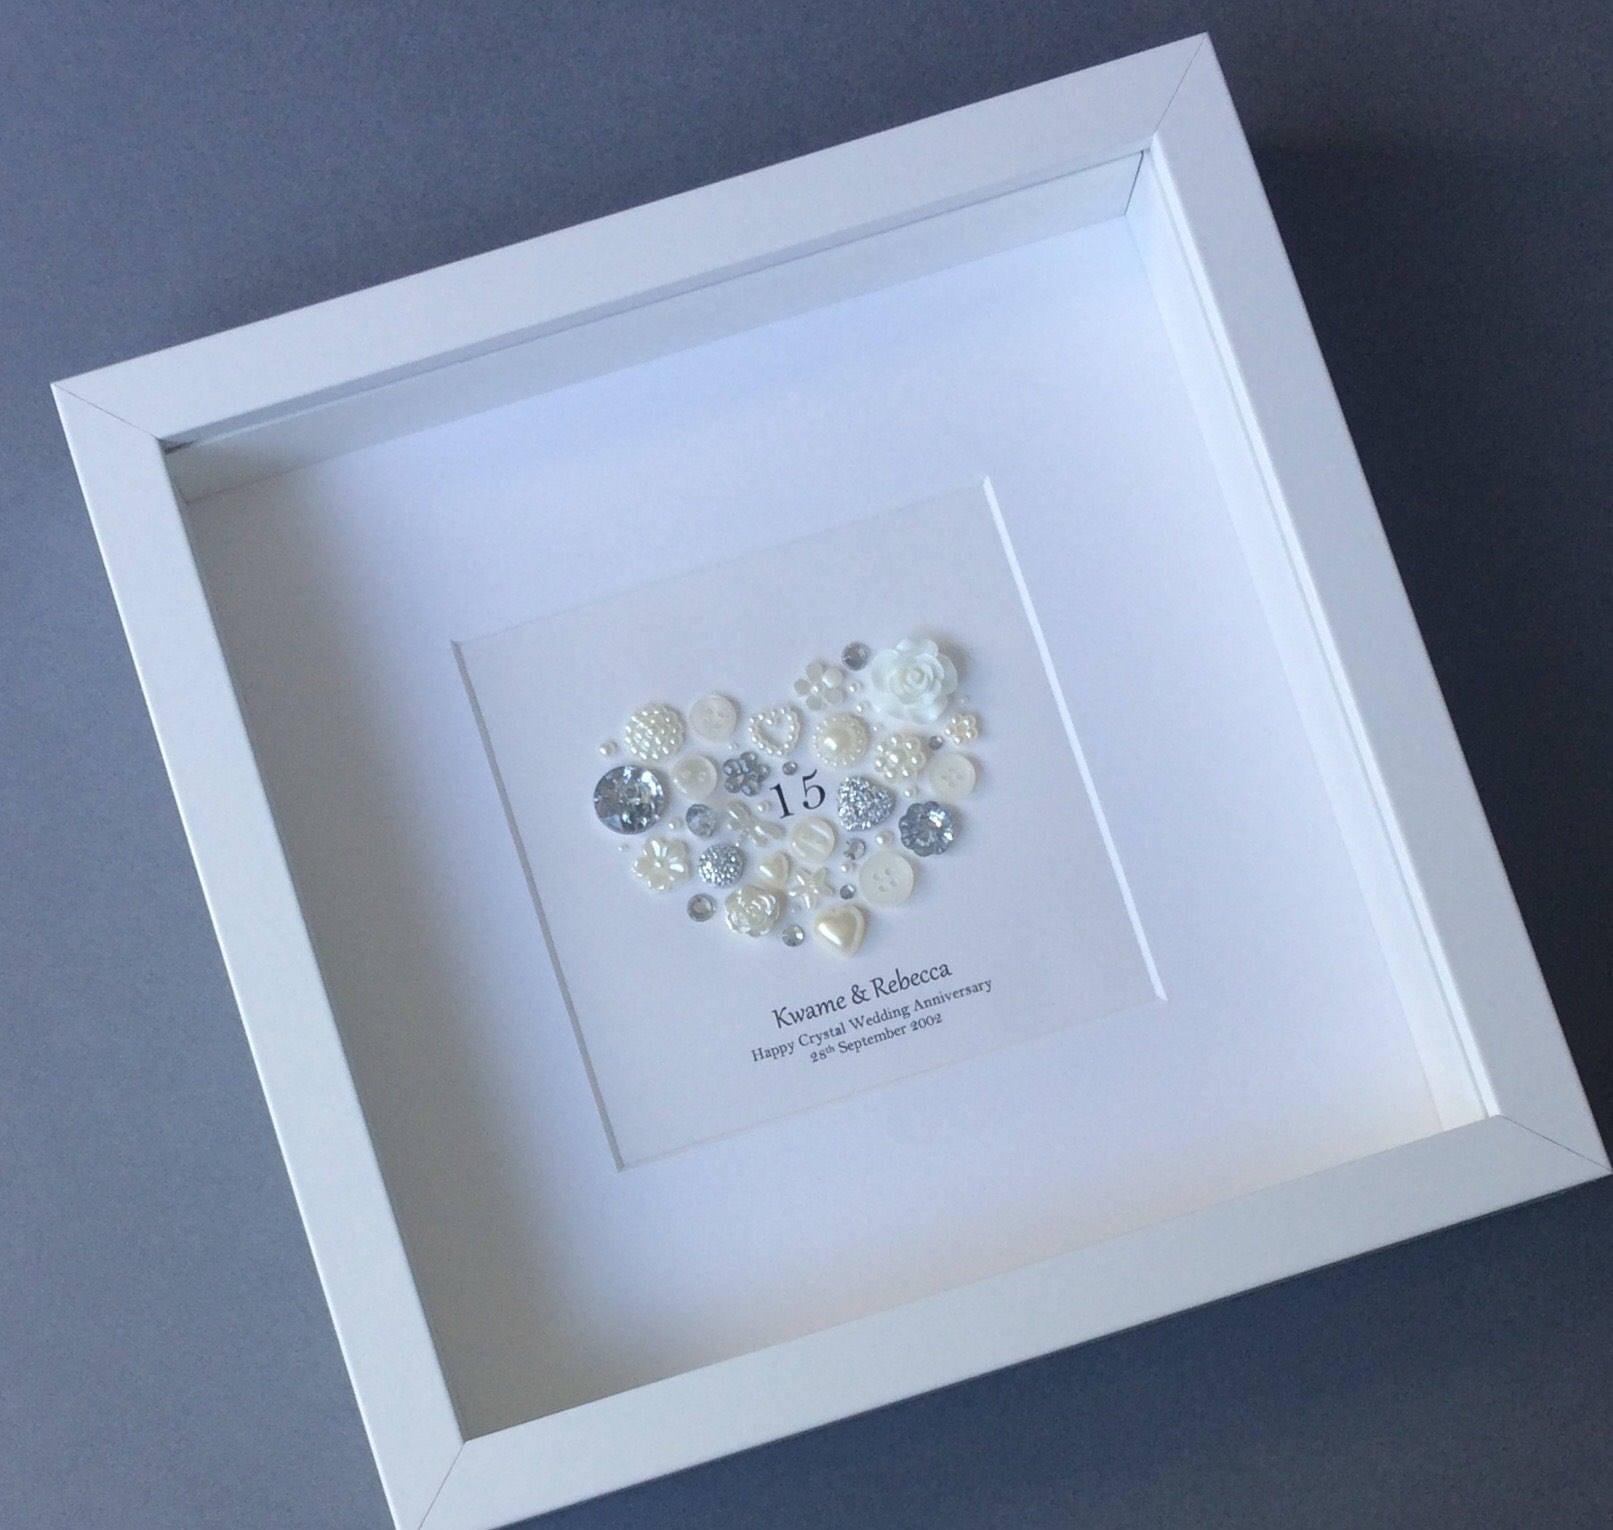 15 Year Wedding Anniversary Gift Crystal: 15th Wedding Anniversary Gift Crystal Anniversary Frame